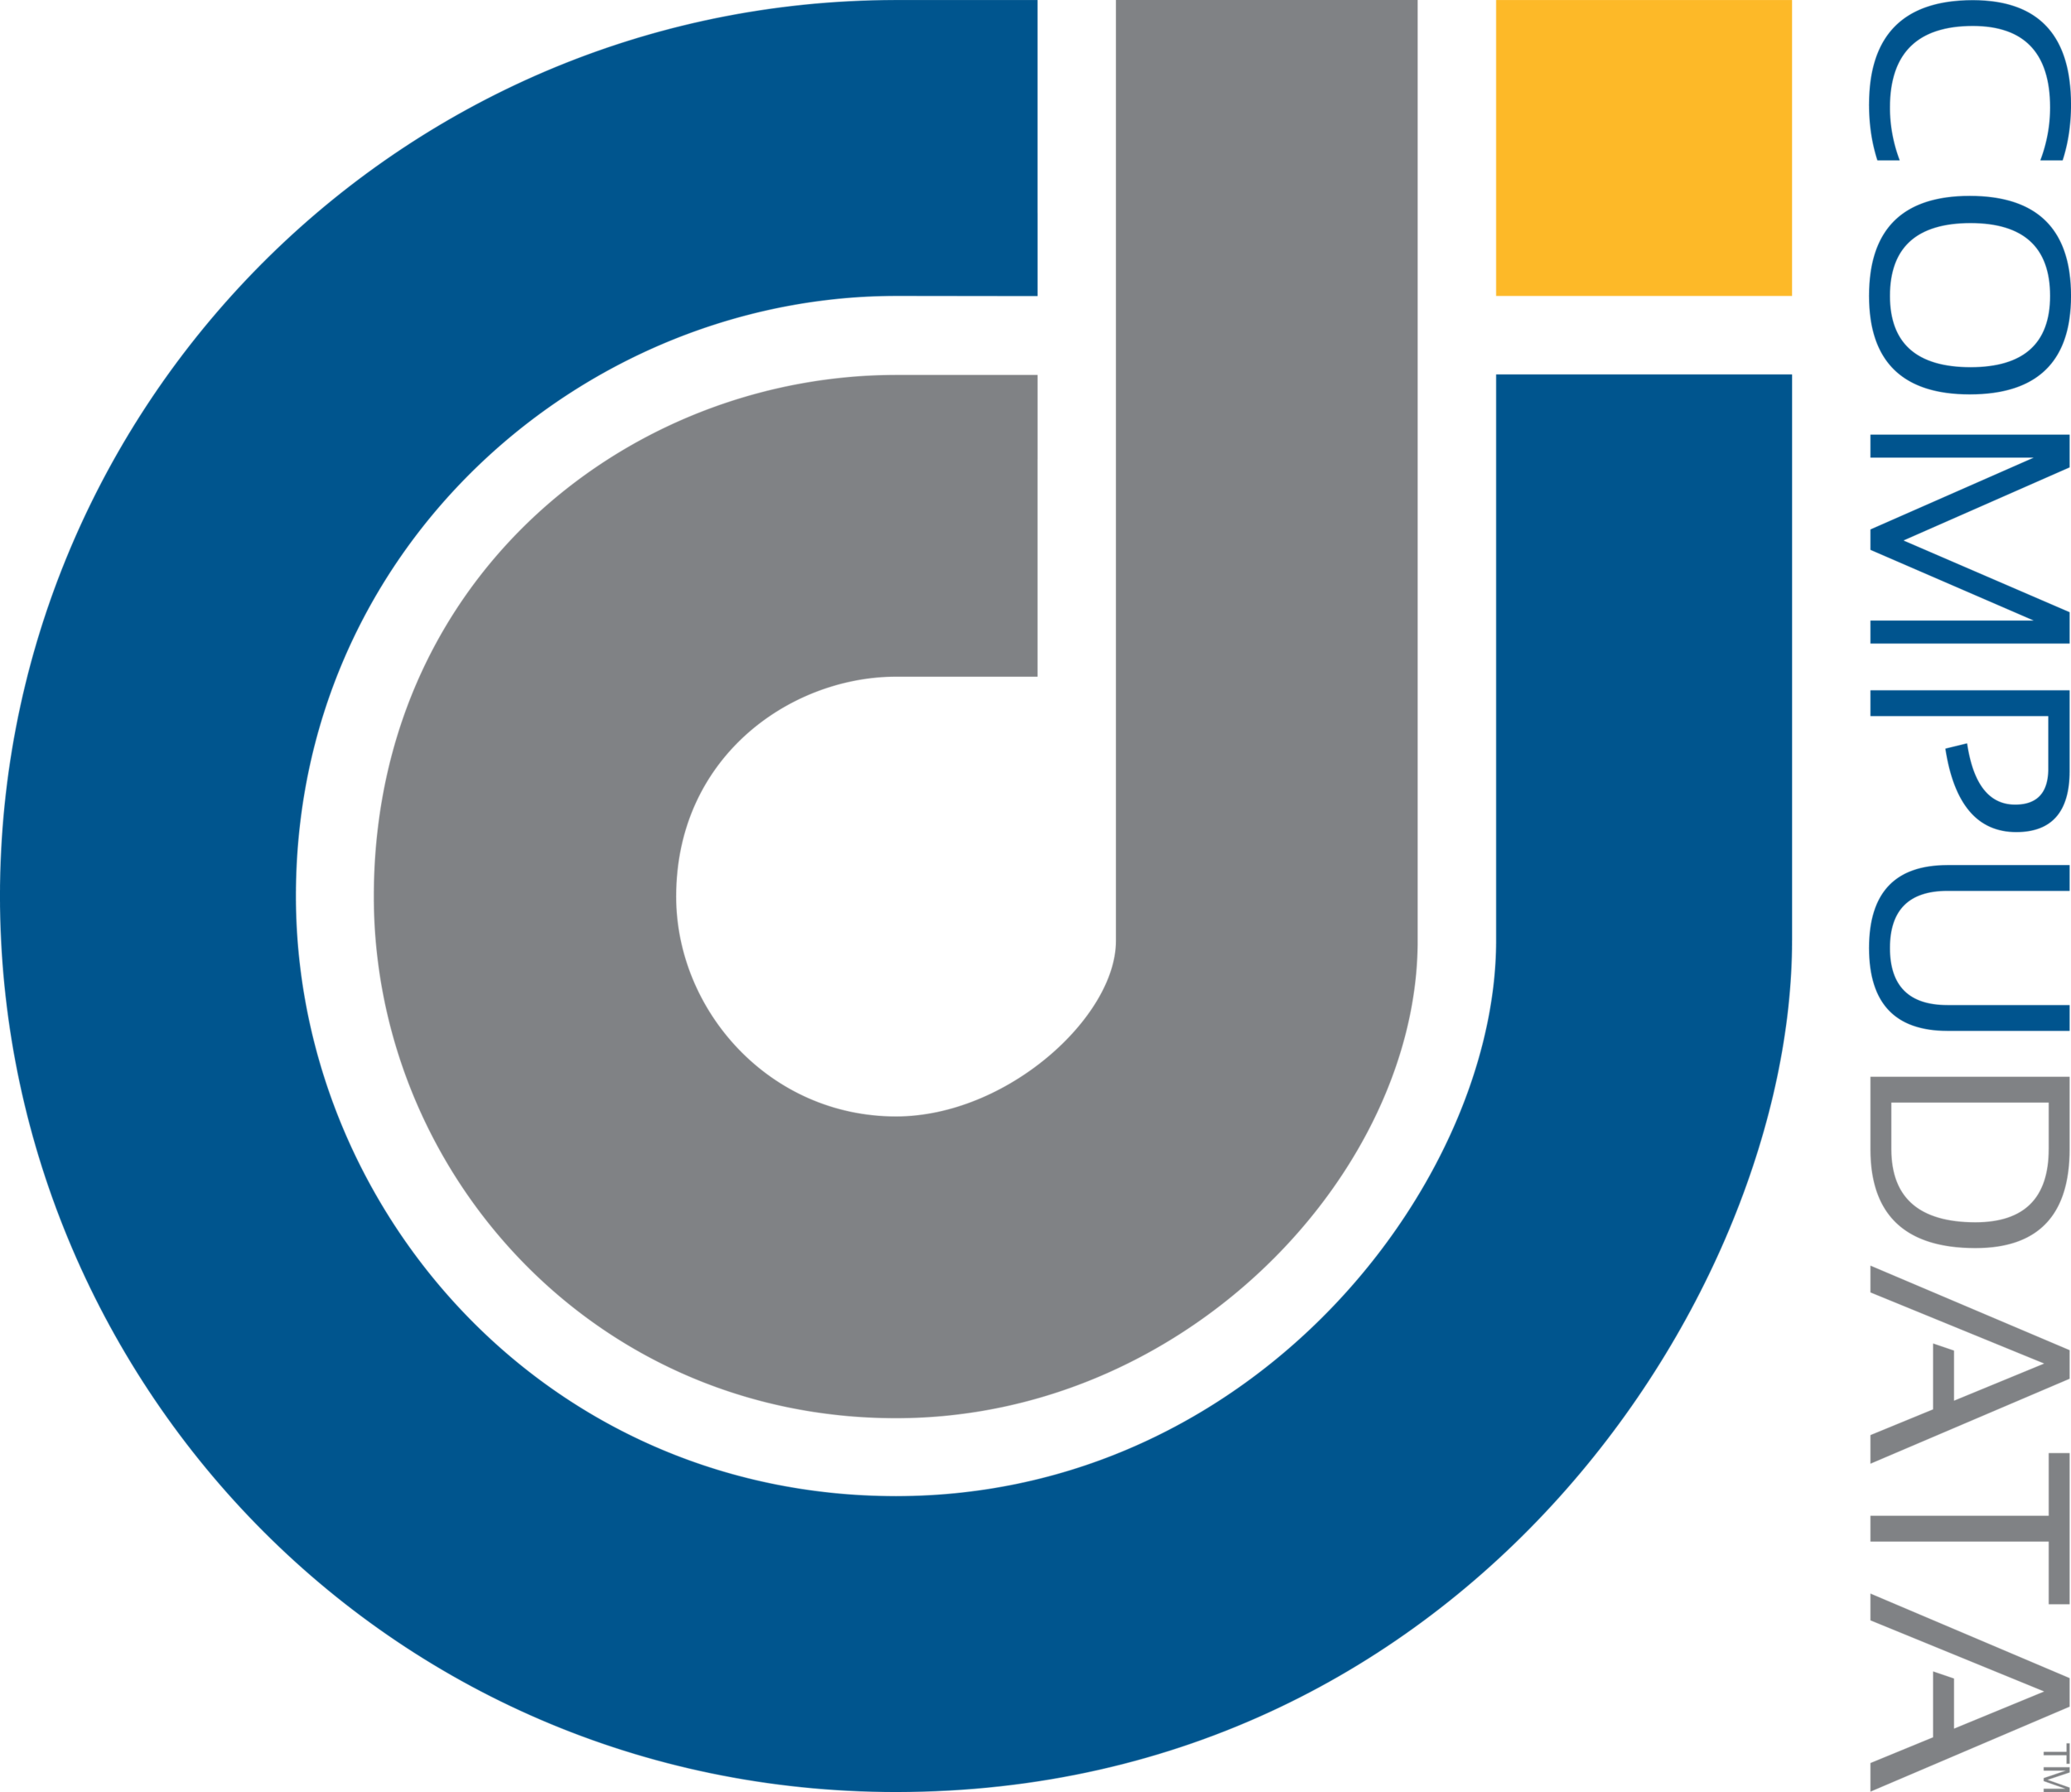 logo-sponsor-leadership-compudata.png